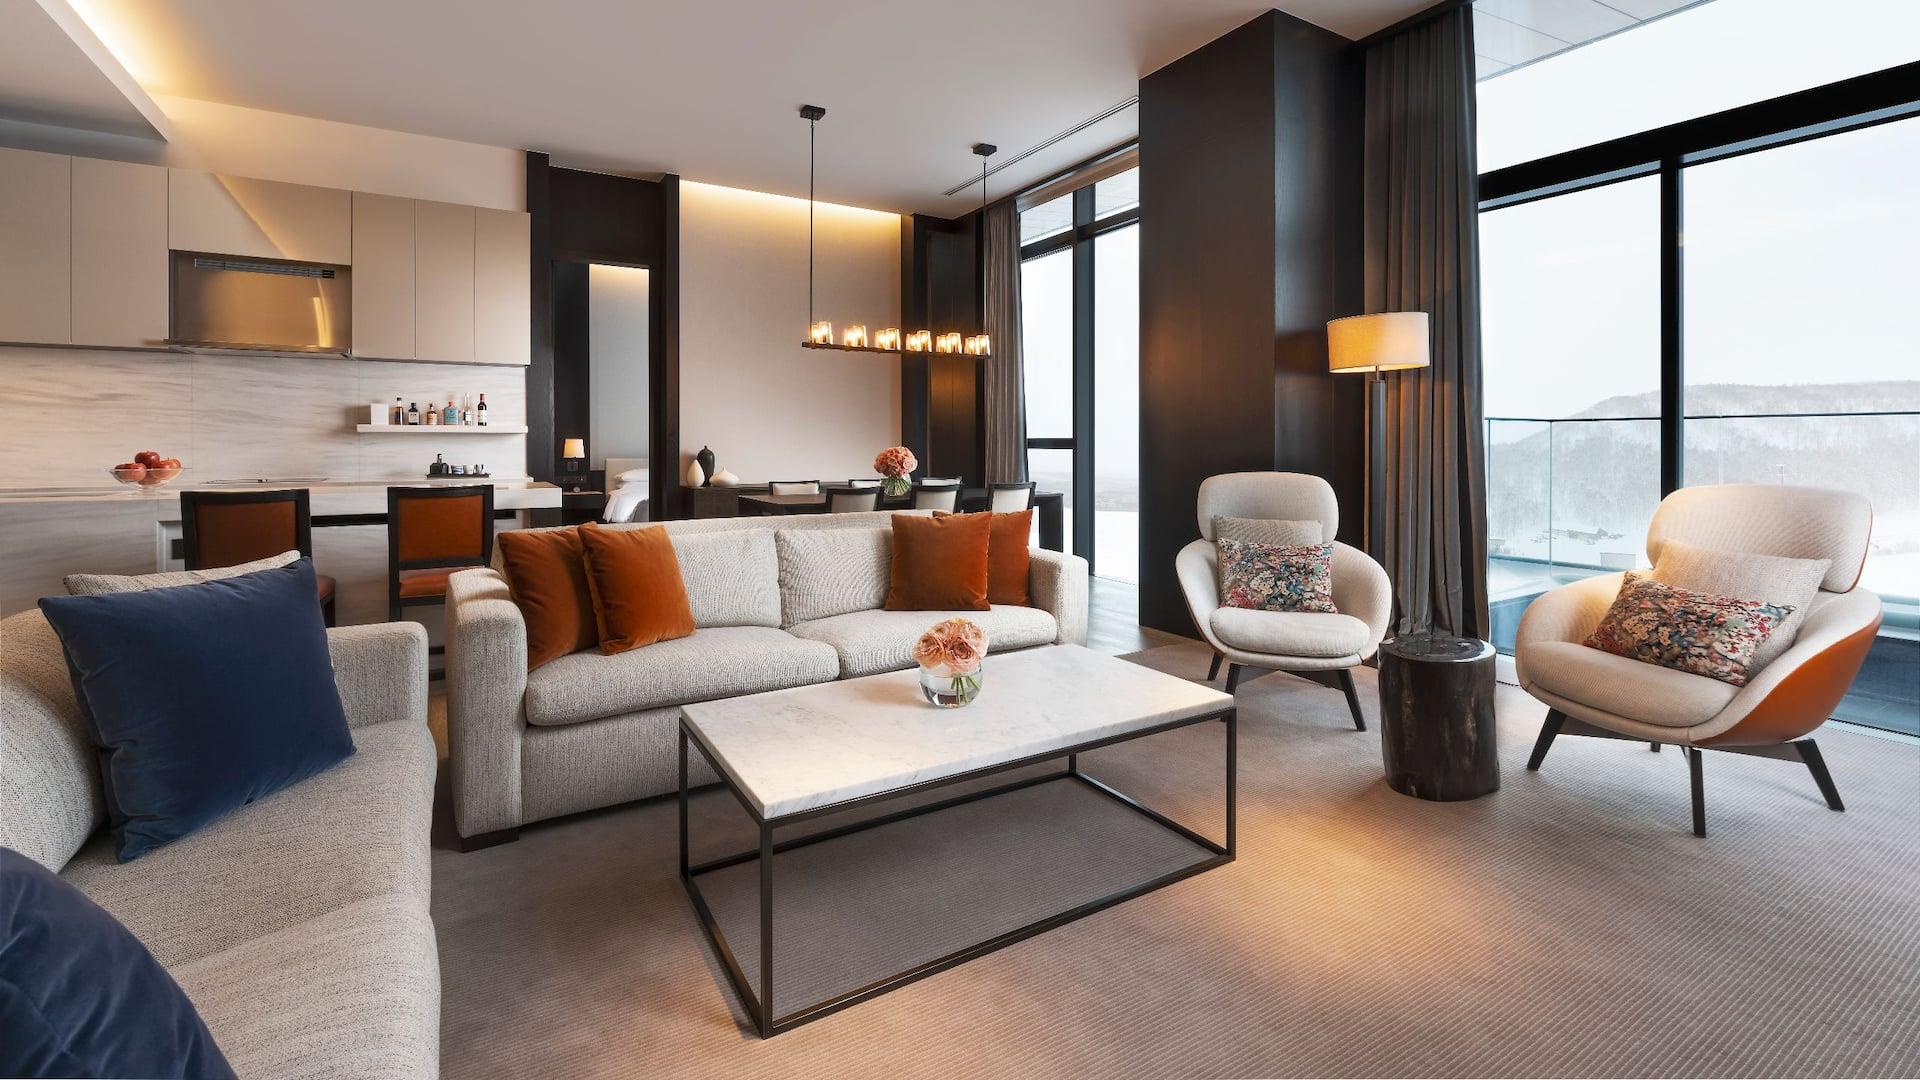 Two Bedroom Penthouse Living Room - Park Hyatt Niseko Hanazono